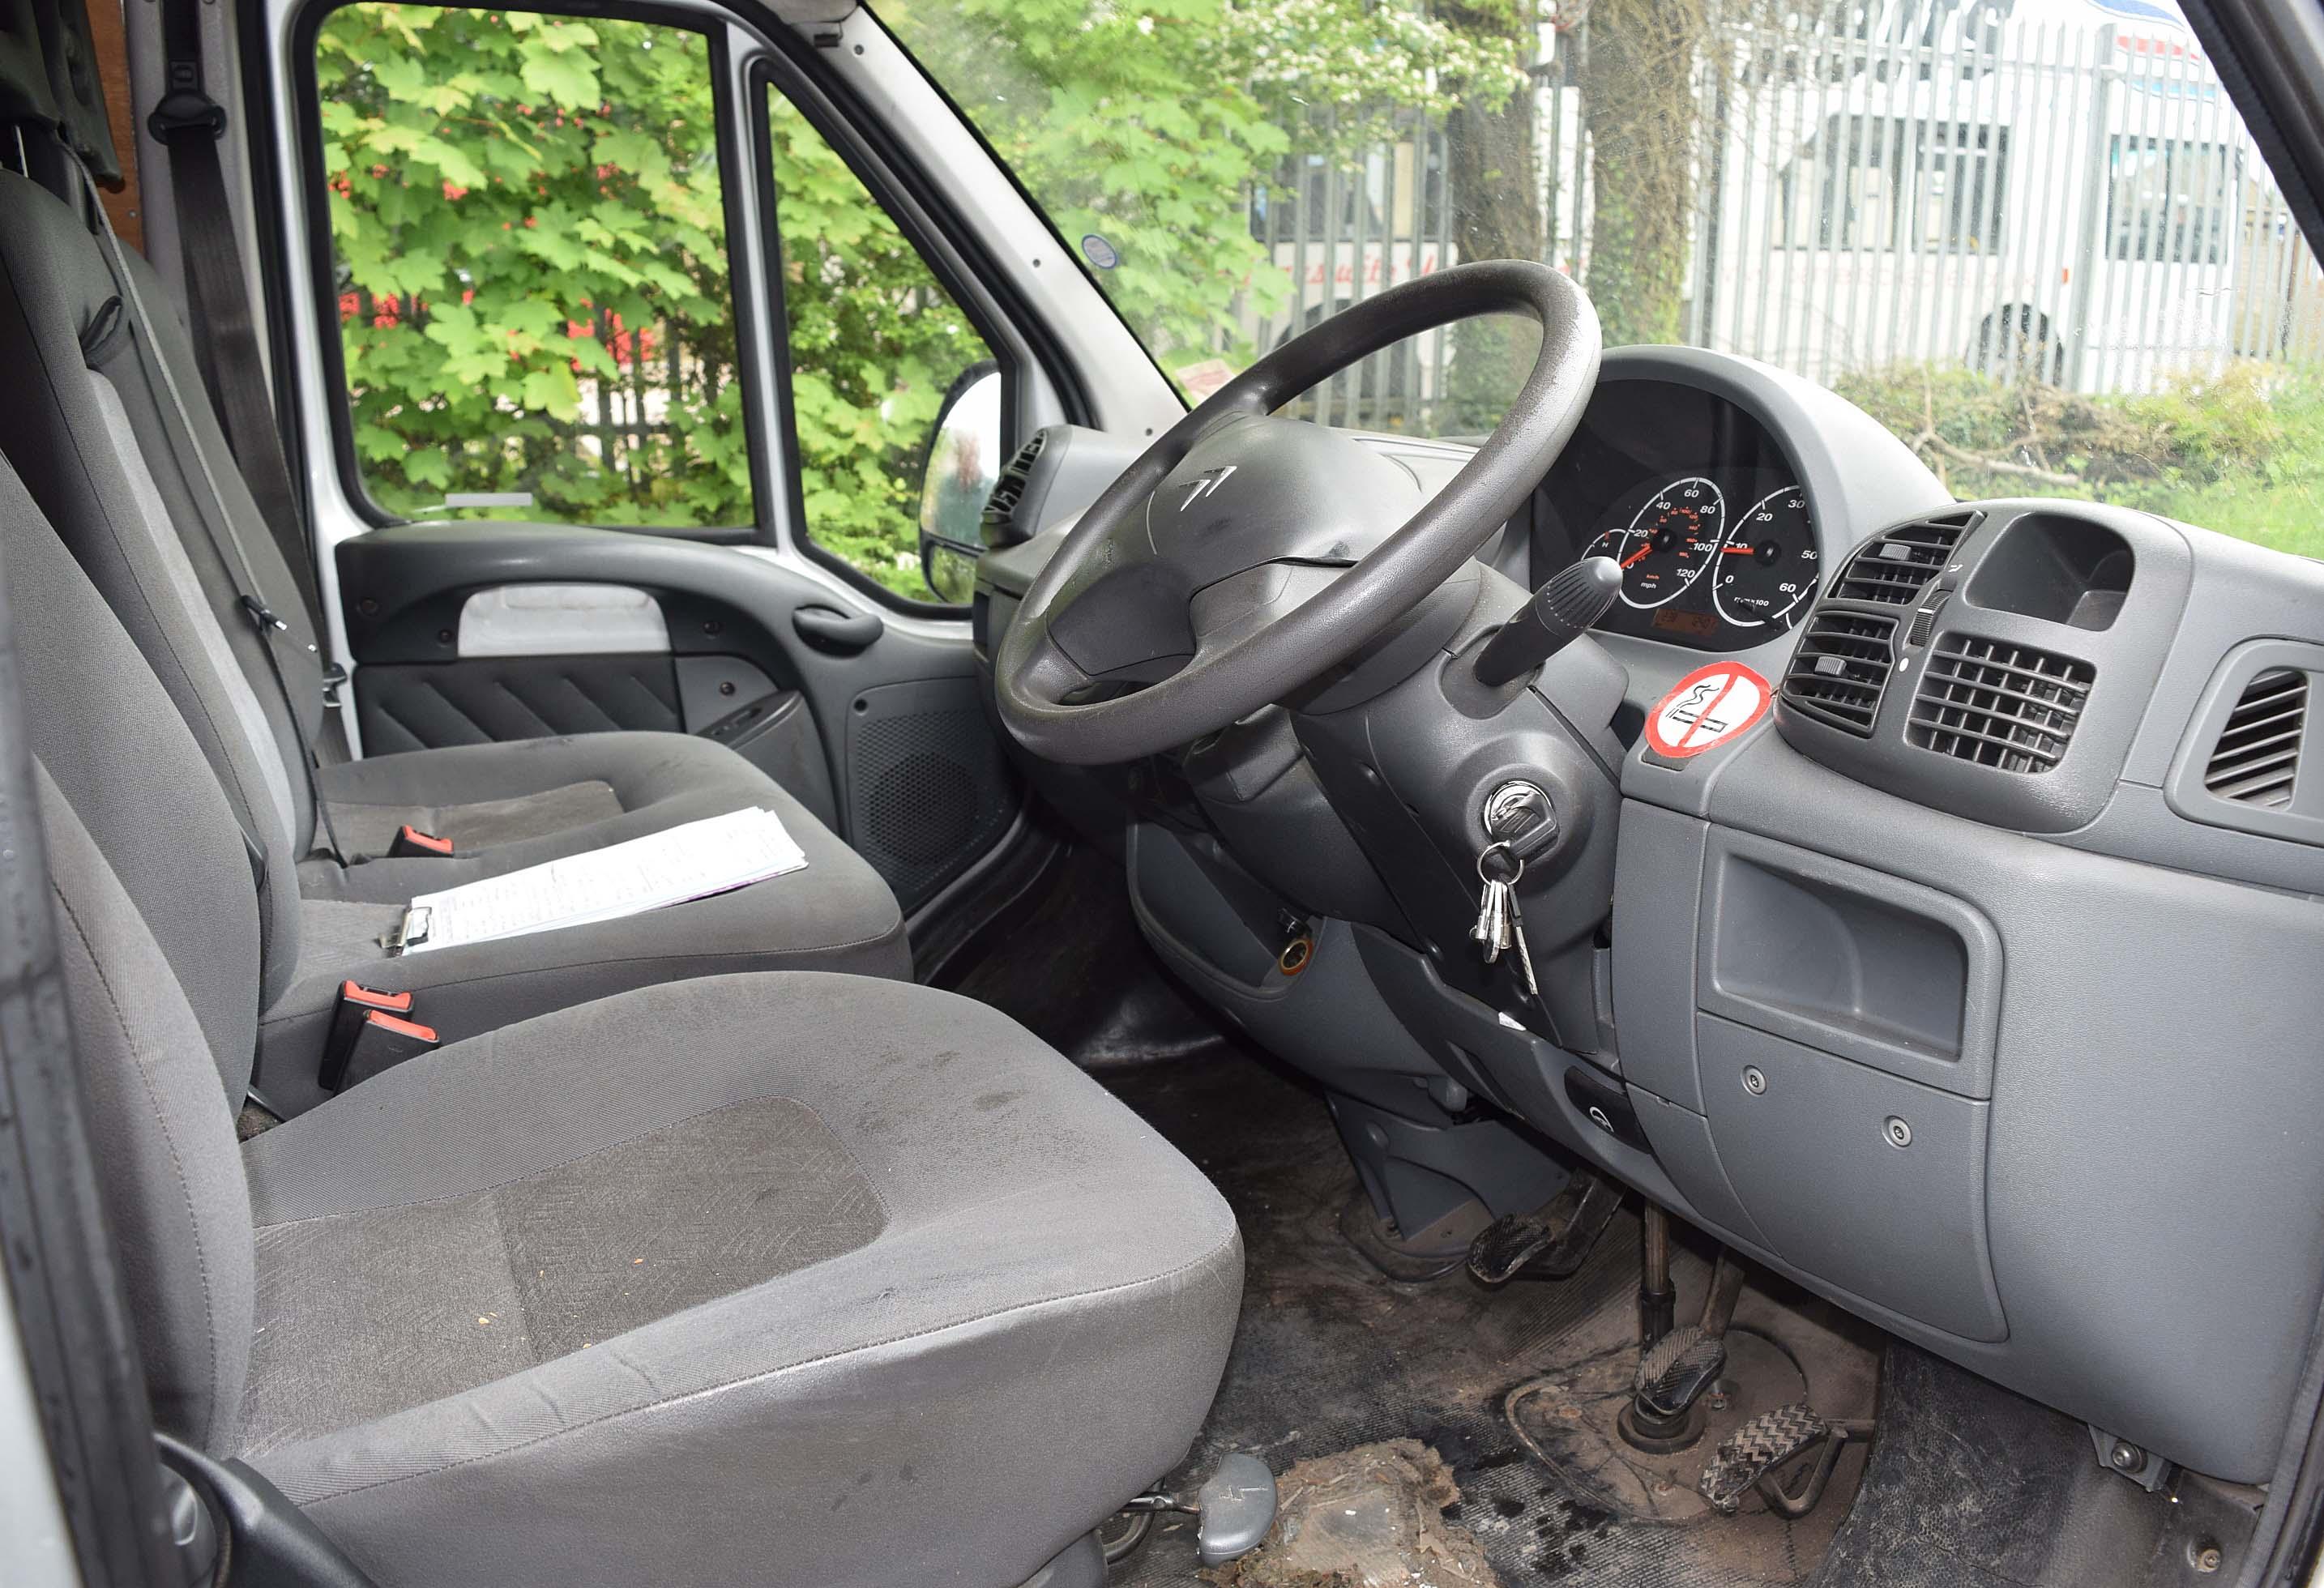 Lot 38 - 2006 CITROEN Relay 1800 HDI Enterprise LWB Diesel Panel Van. 5 Speed Manual. Rear Barn Doors and